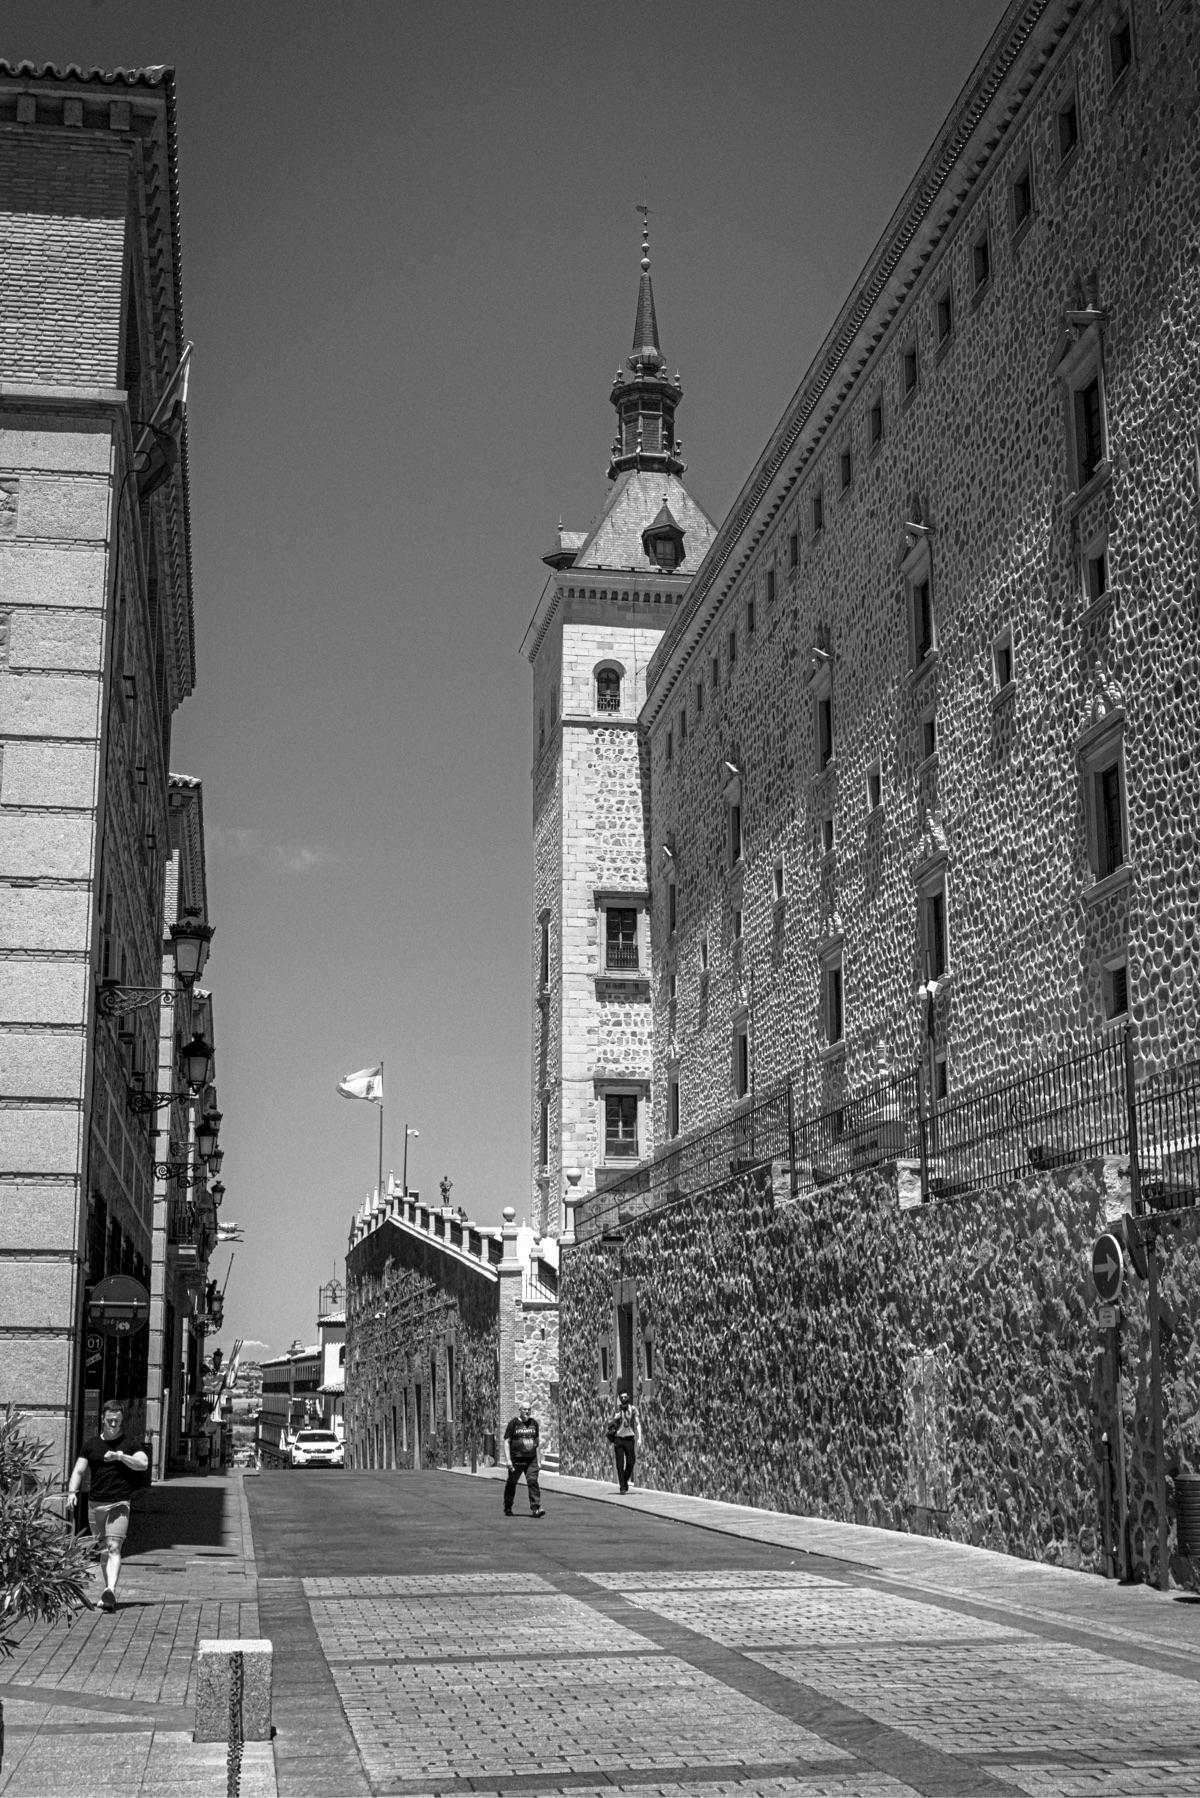 europe, travelphotography, blackandwhite - photocharly046   ello